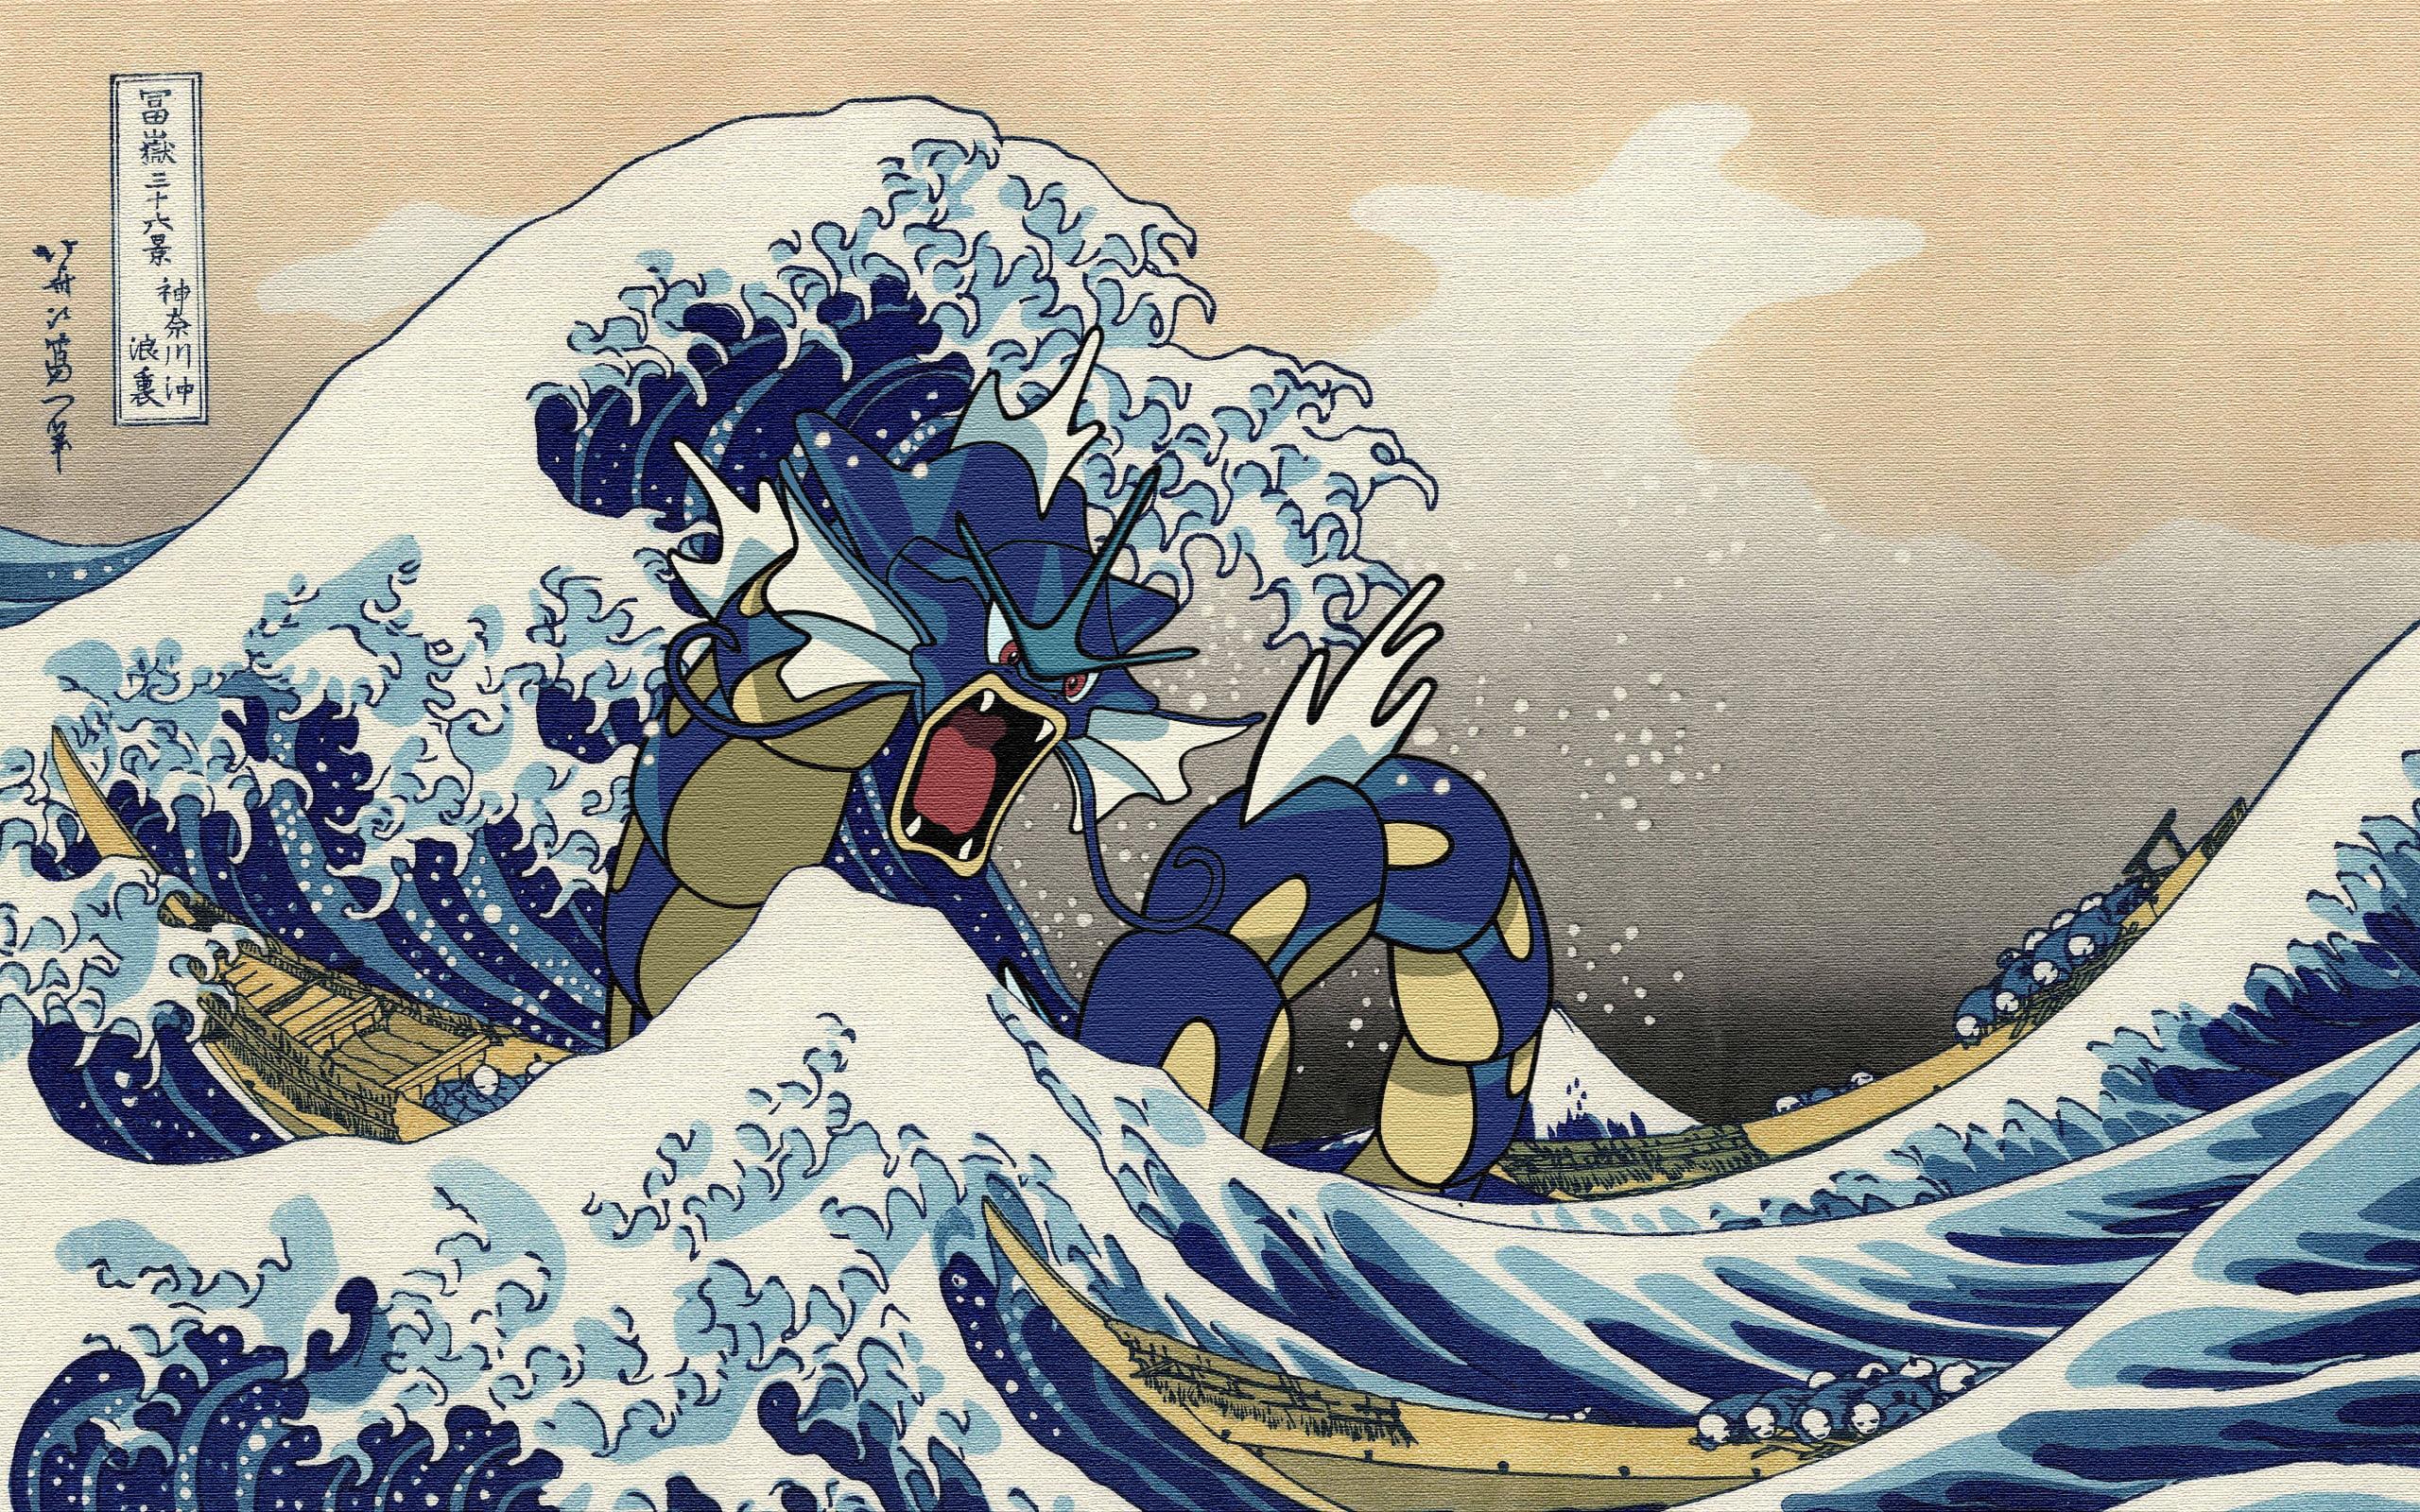 Pokemon Gyarados illustration video games retro games anime 2560x1600